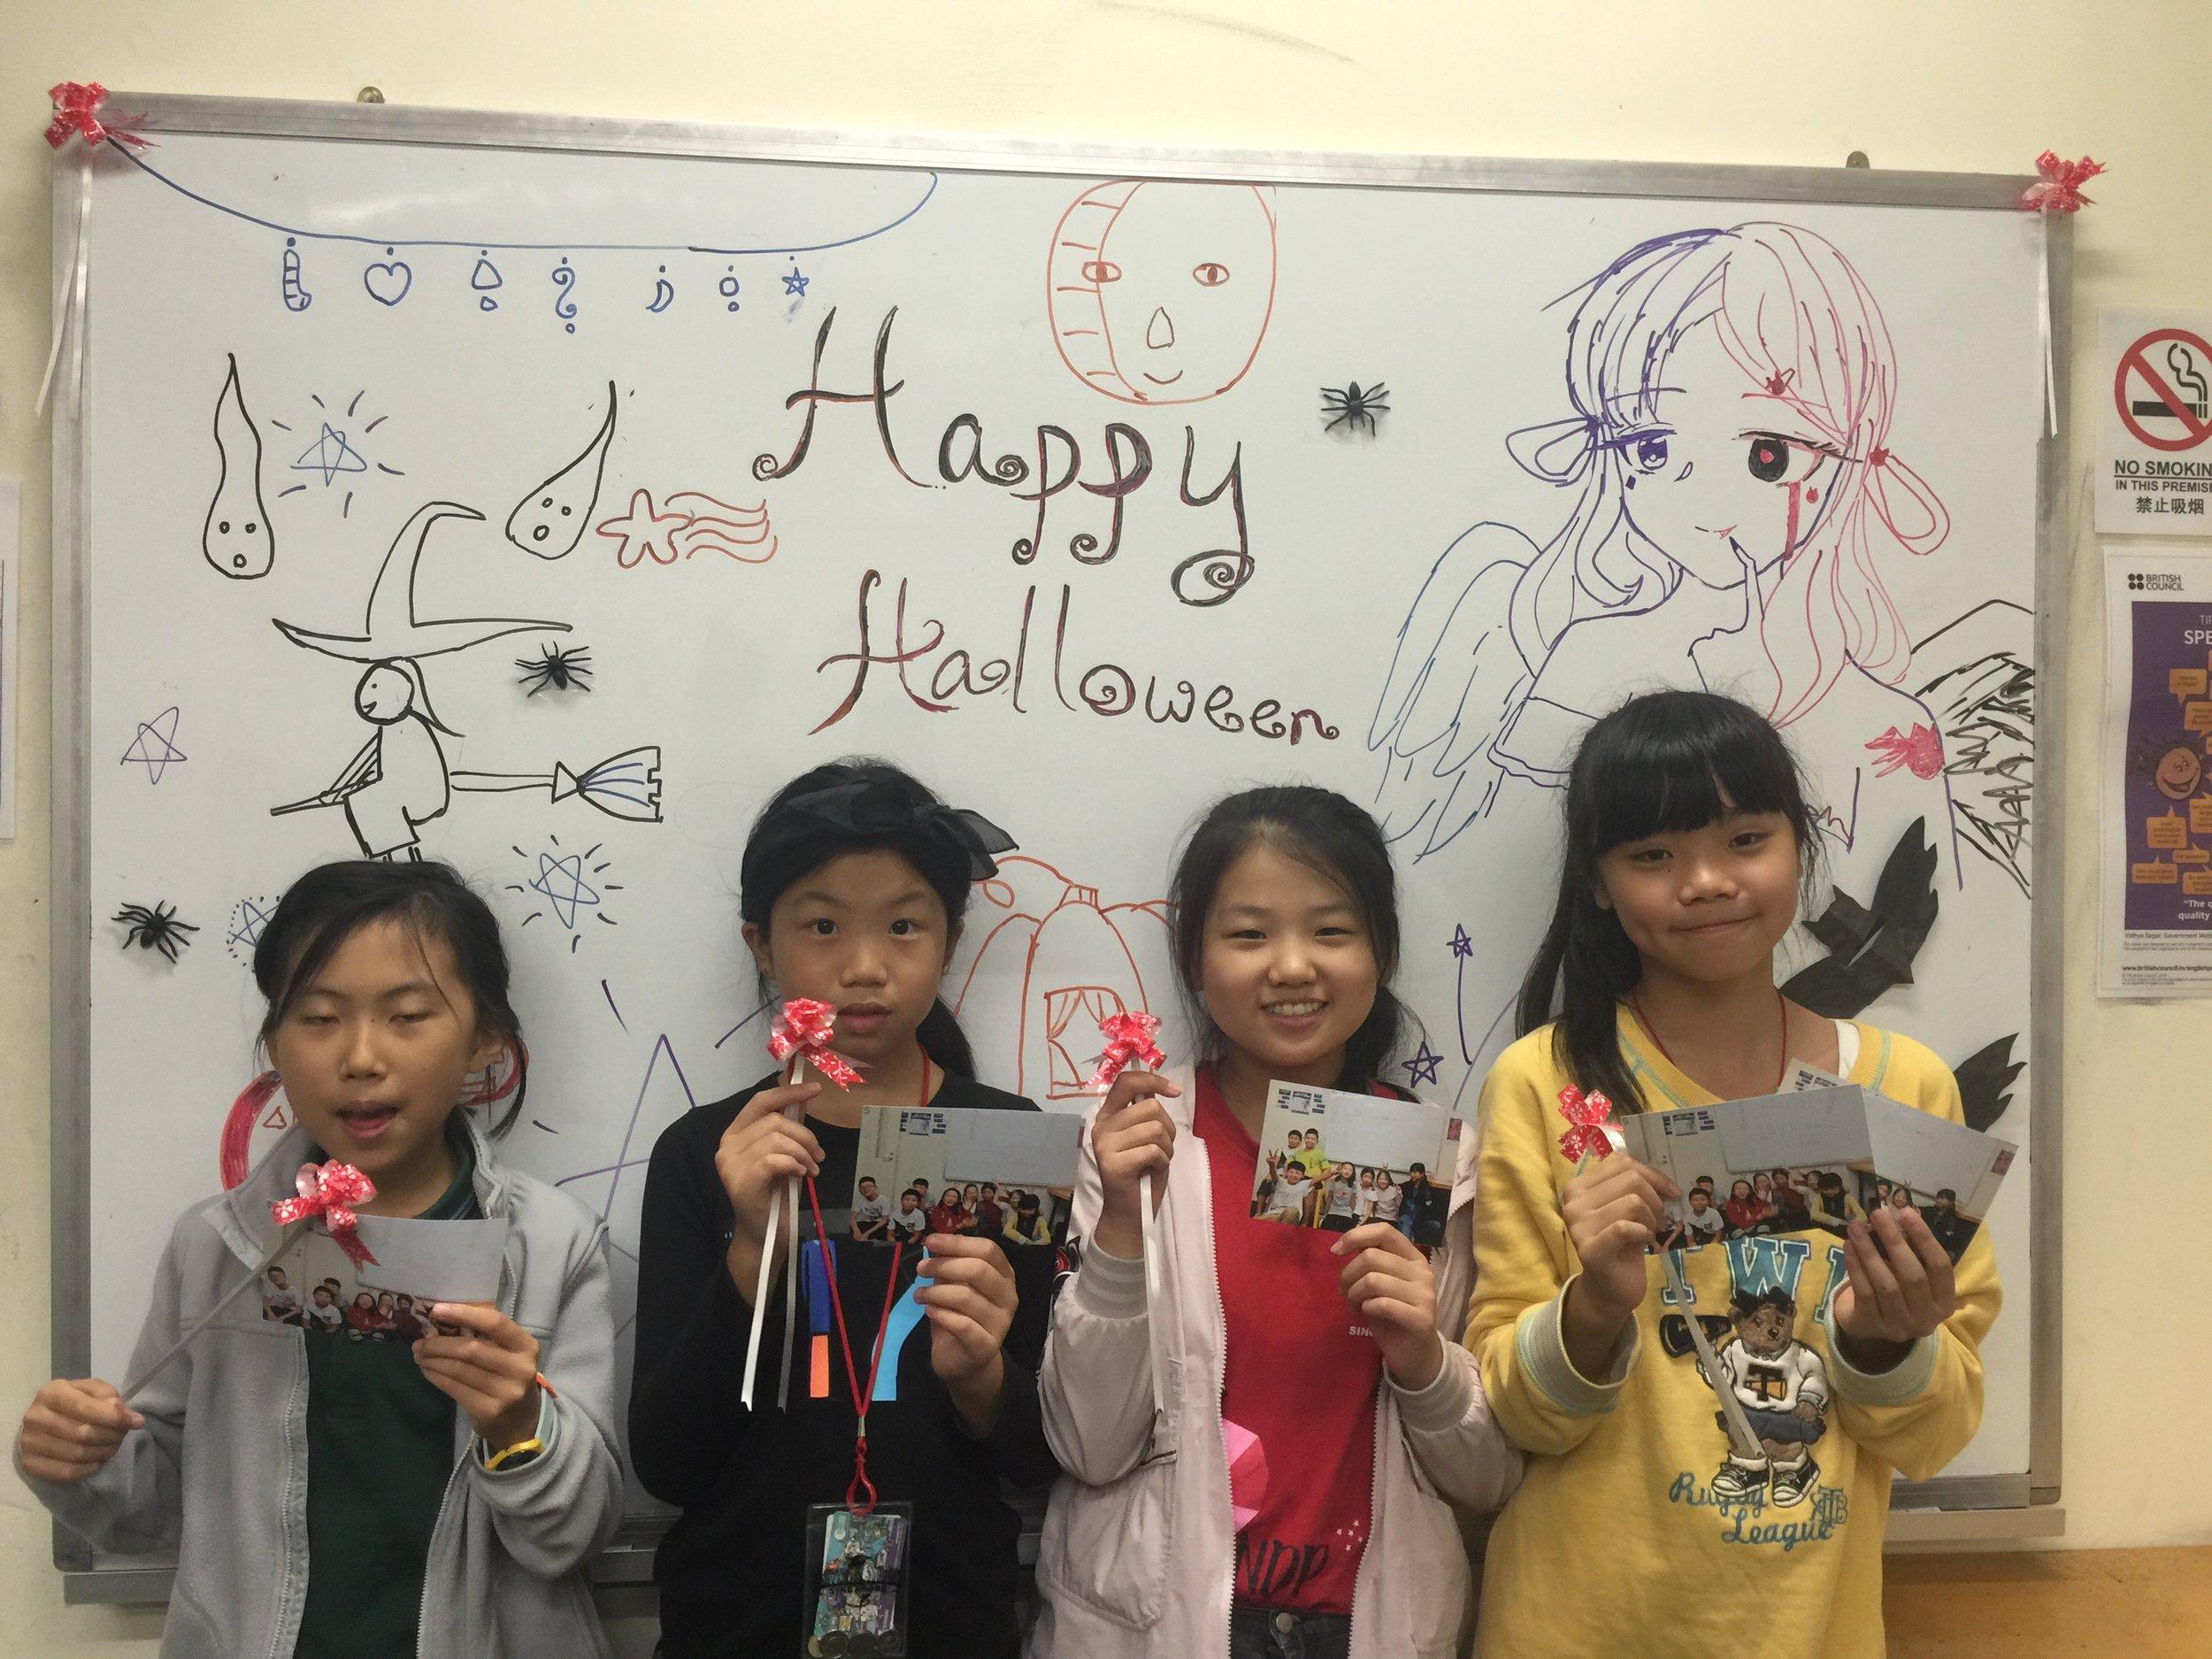 Happy Halloween_P5 Math class (1).JPG